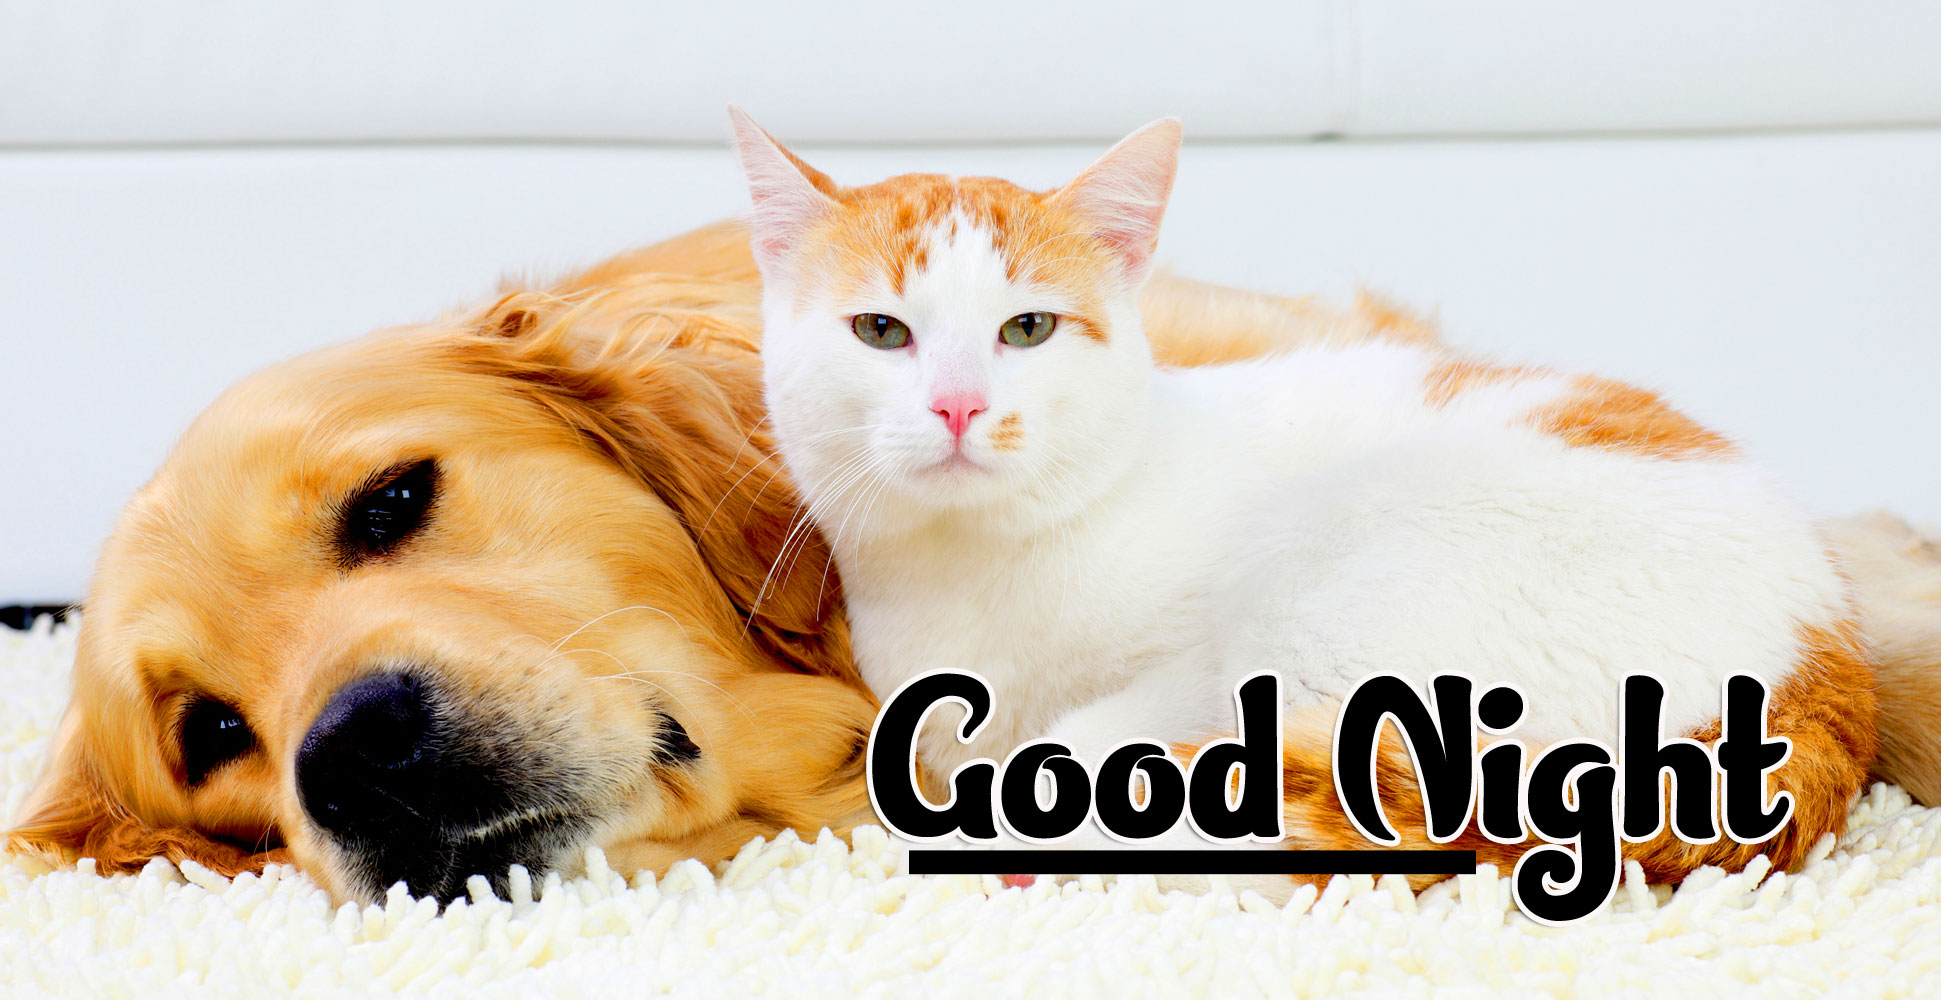 Cute Good Night Images Pics Wallpaper Free Download